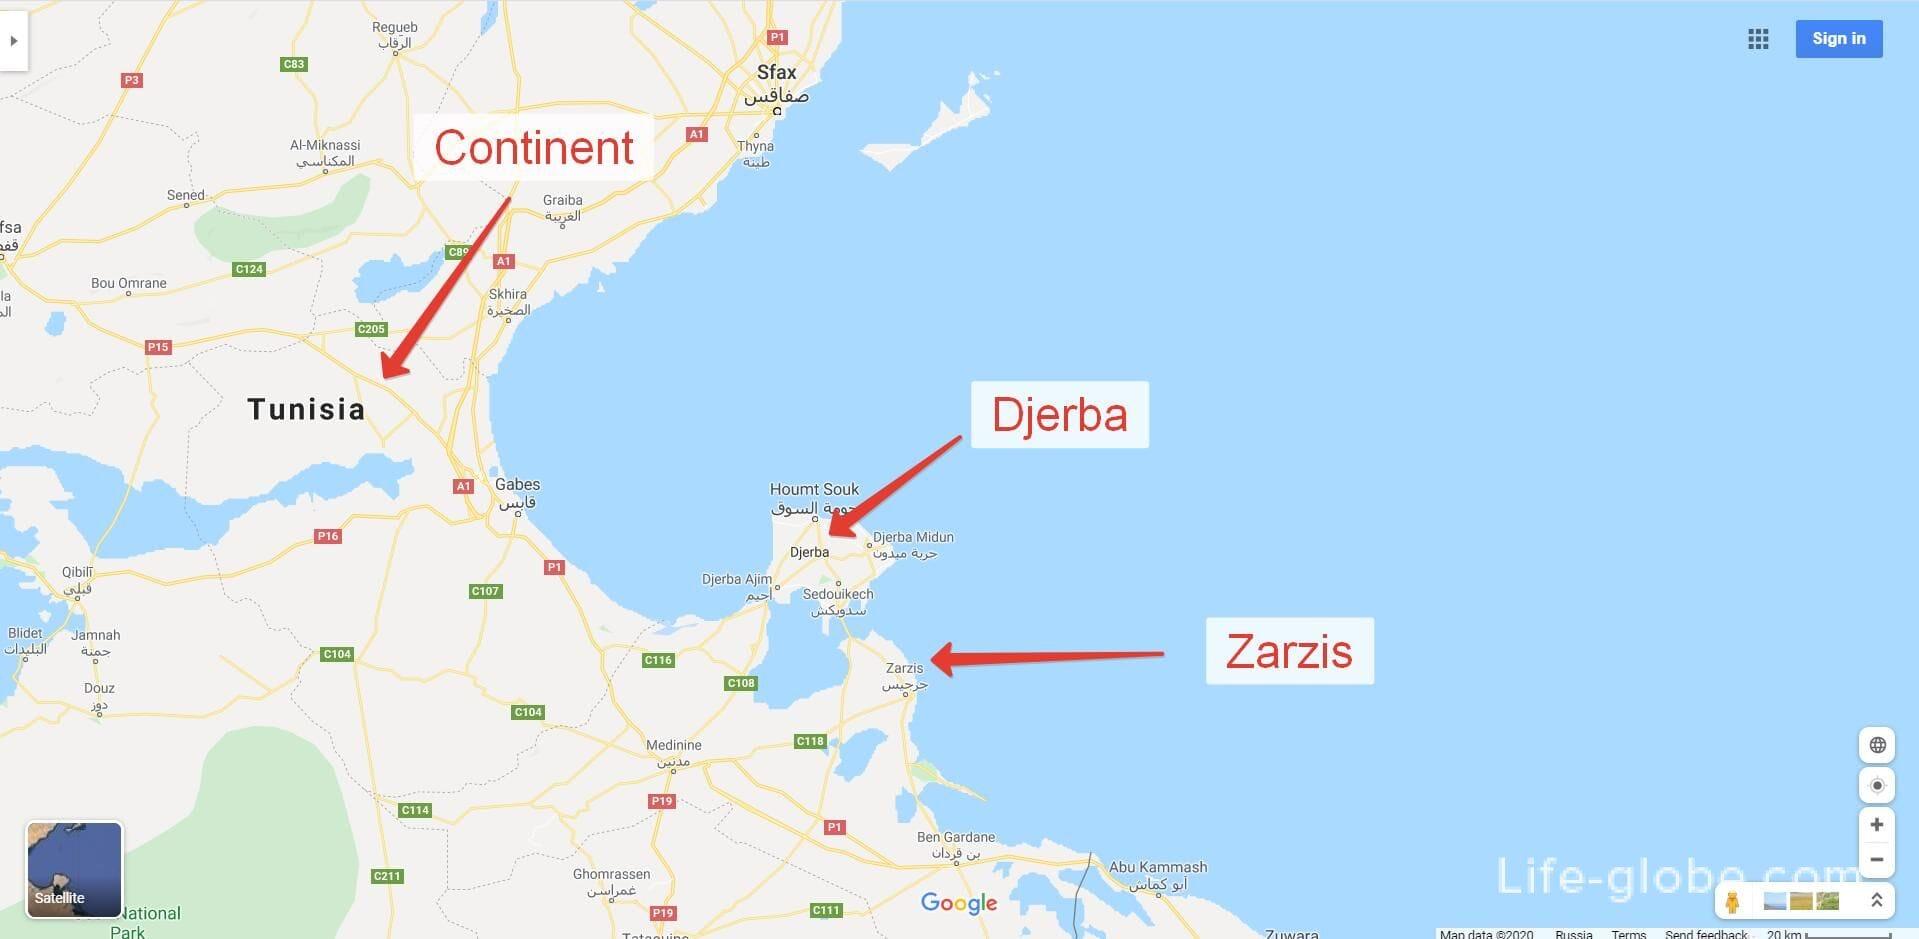 Djerba island on the map